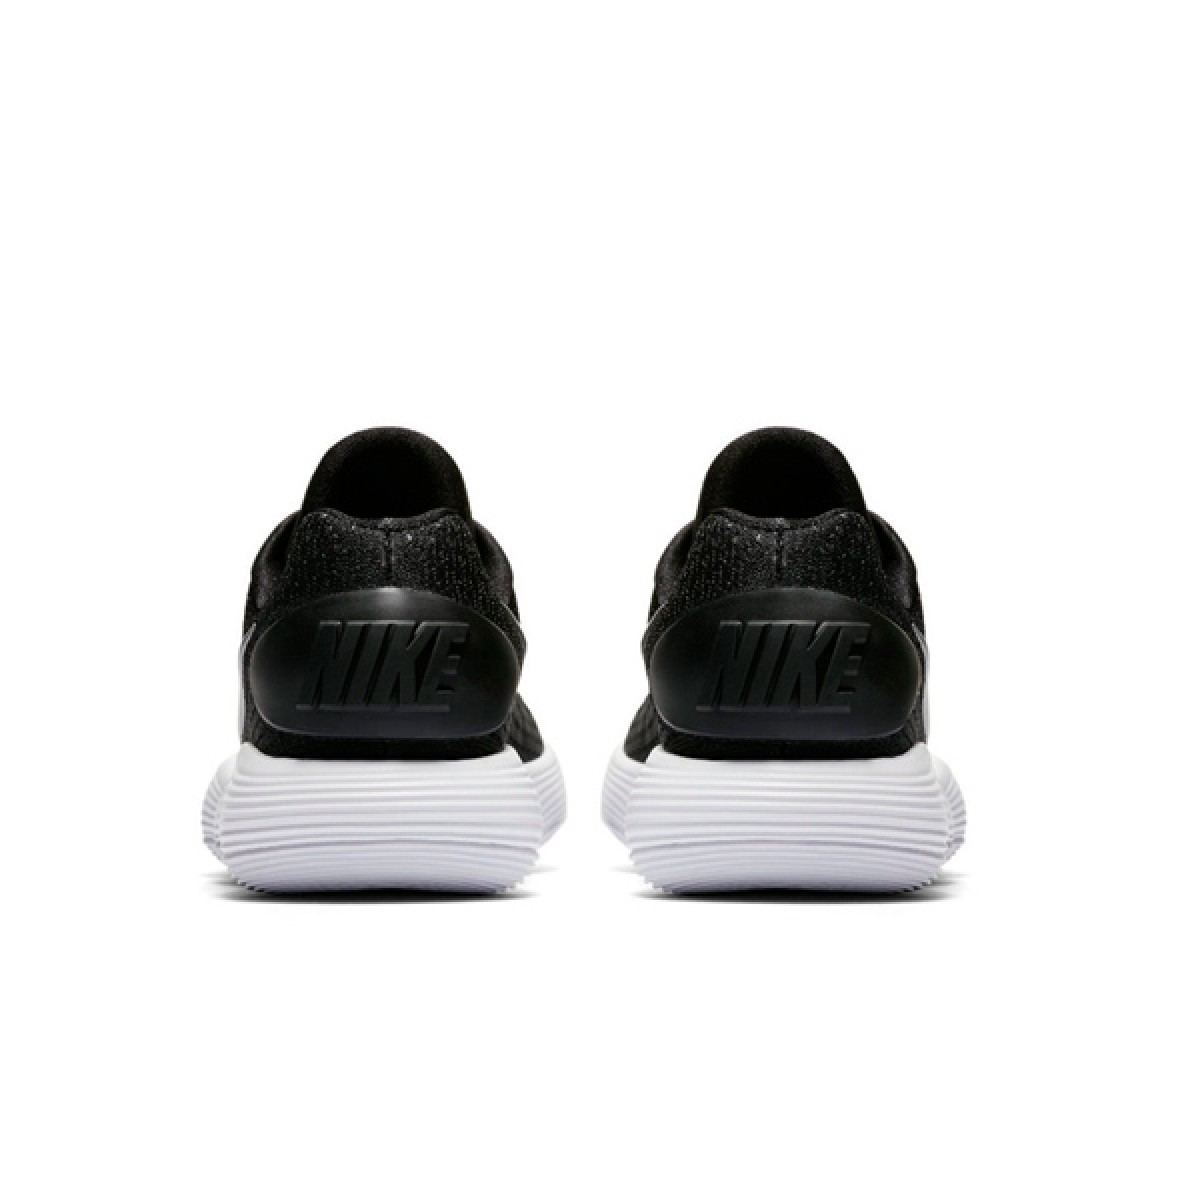 Nike Womens Hyperdunk 2017 Low 'Black' 897812-001